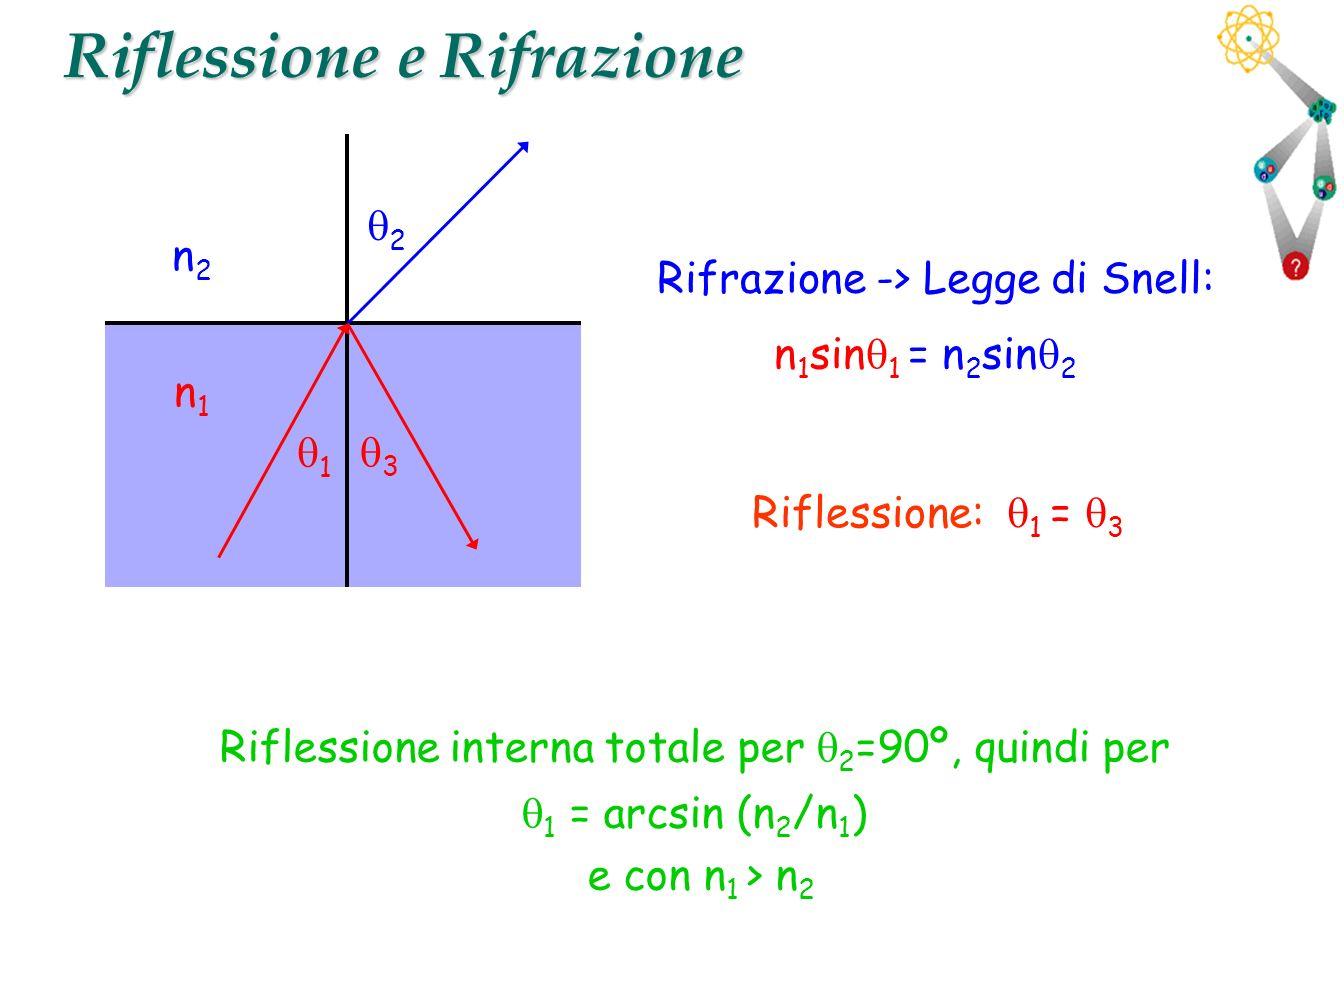 17 Riflessione e Rifrazione Riflessione: Rifrazione -> Legge di Snell: n 1 sin 1 = n 2 sin 2 1 = 3 n1n1 n2n2 1 3 2 Riflessione interna totale per 2 =9